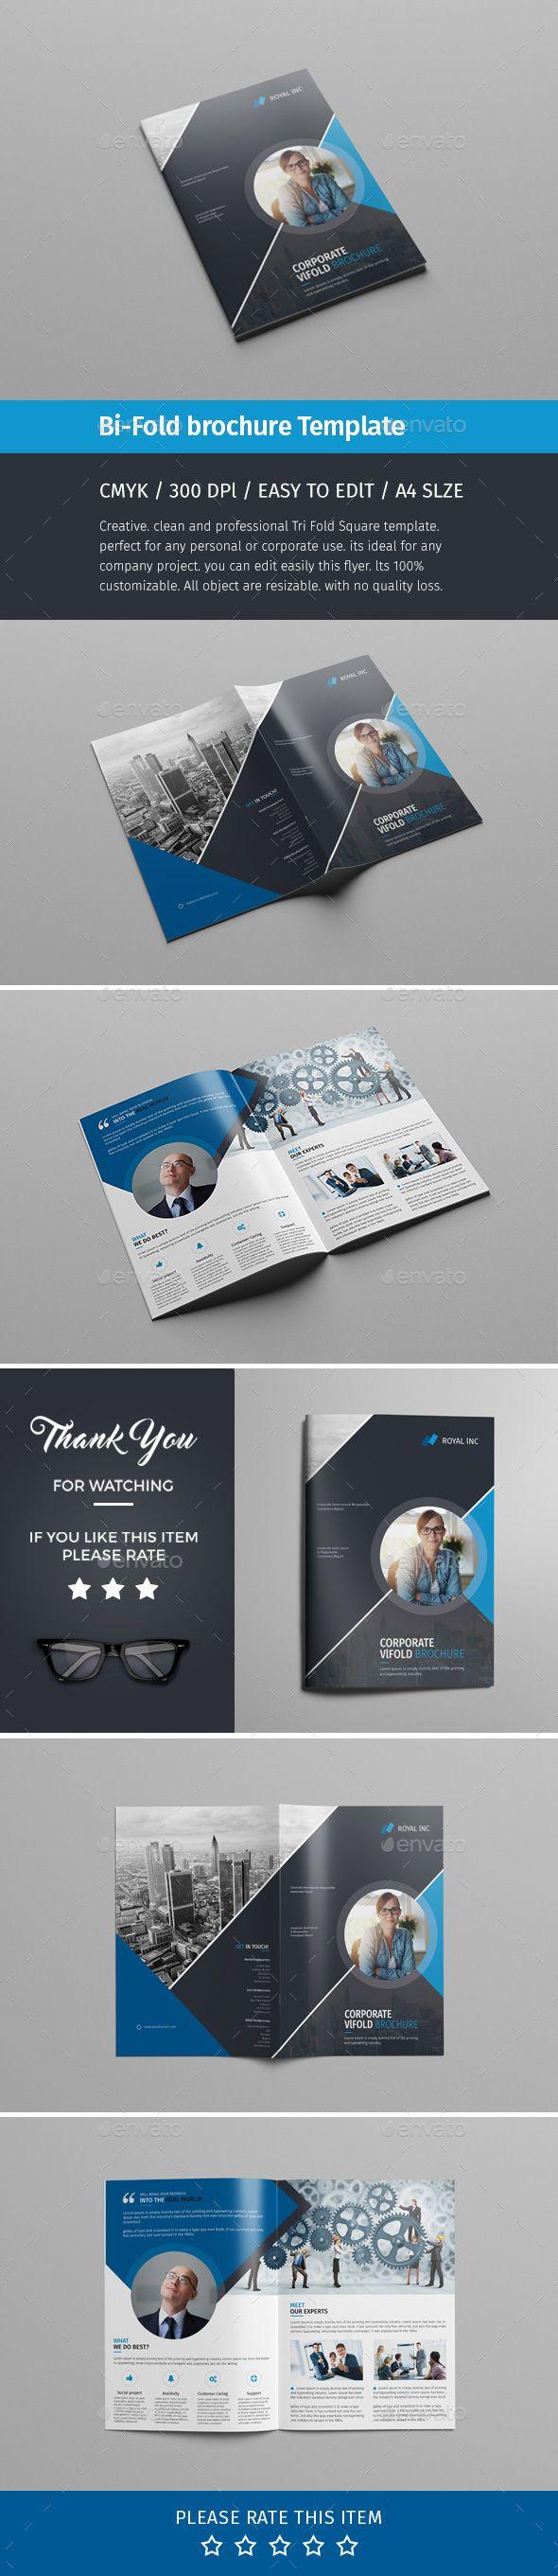 Corporate Bi-fold Brochure Template PSD. Download here: http://graphicriver.net/item/-corporate-bifold-brochuremultipurpose-05/16722994?ref=ksioks